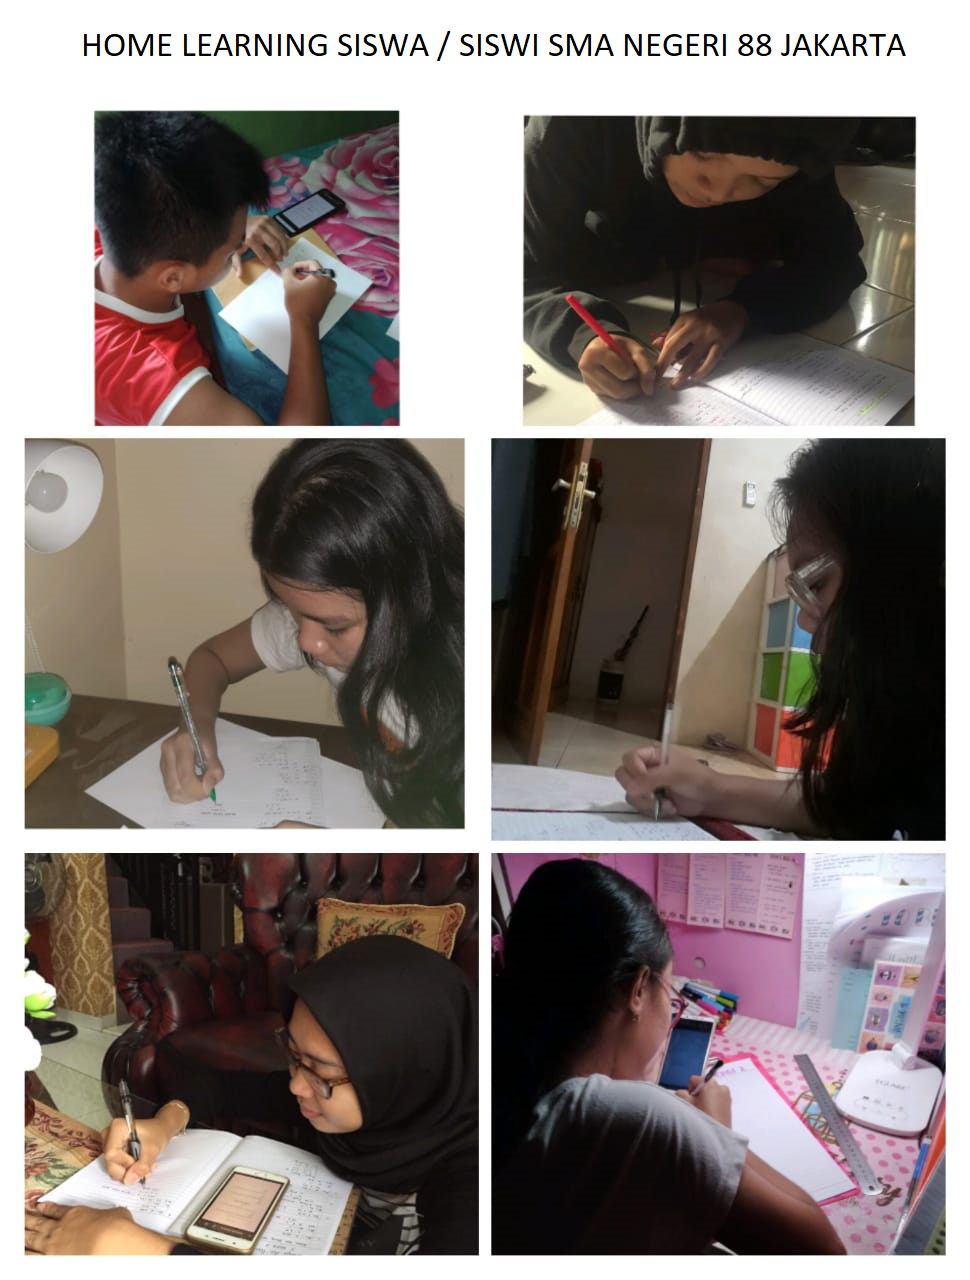 KEGIATAN SISWA / SISWI HOME LEARNING